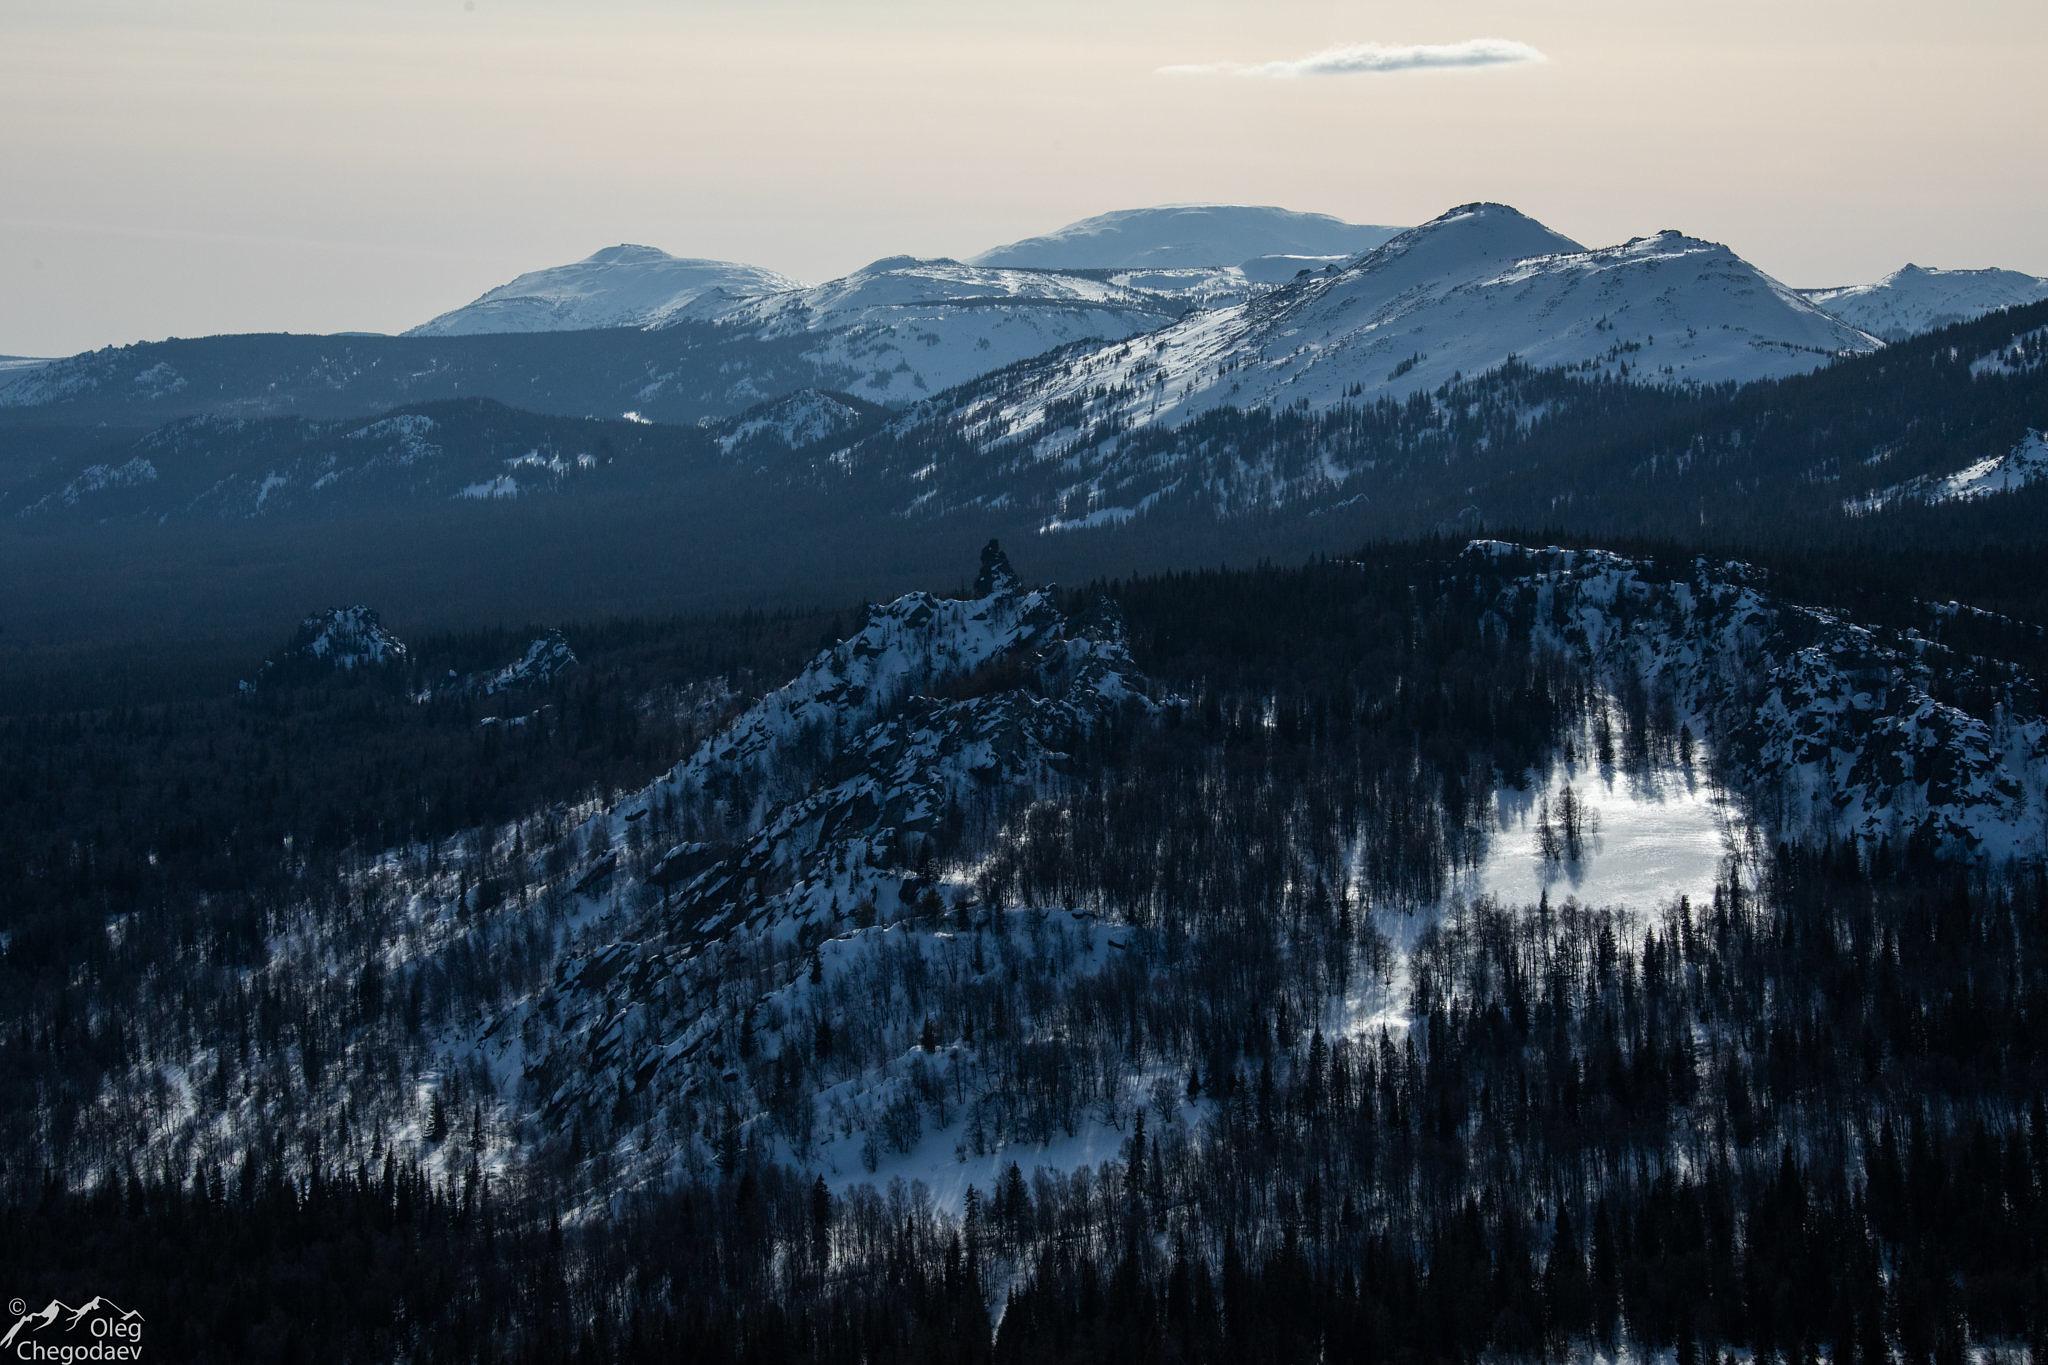 Вид на Ямантау, Машак, Кумардак, приступки с горы Медвежья